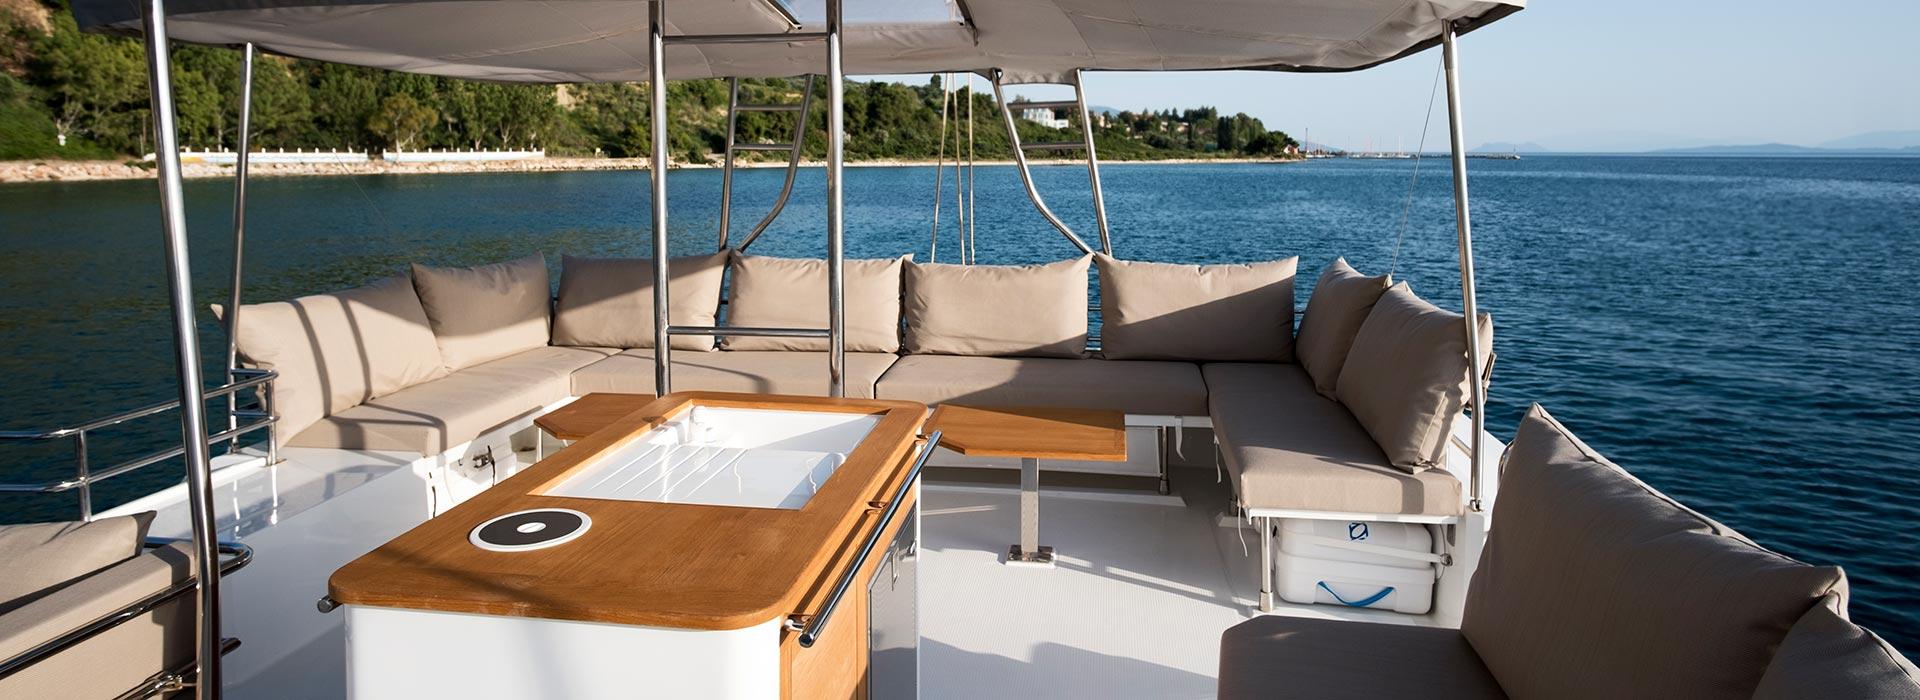 Engine inside a luxury yacht